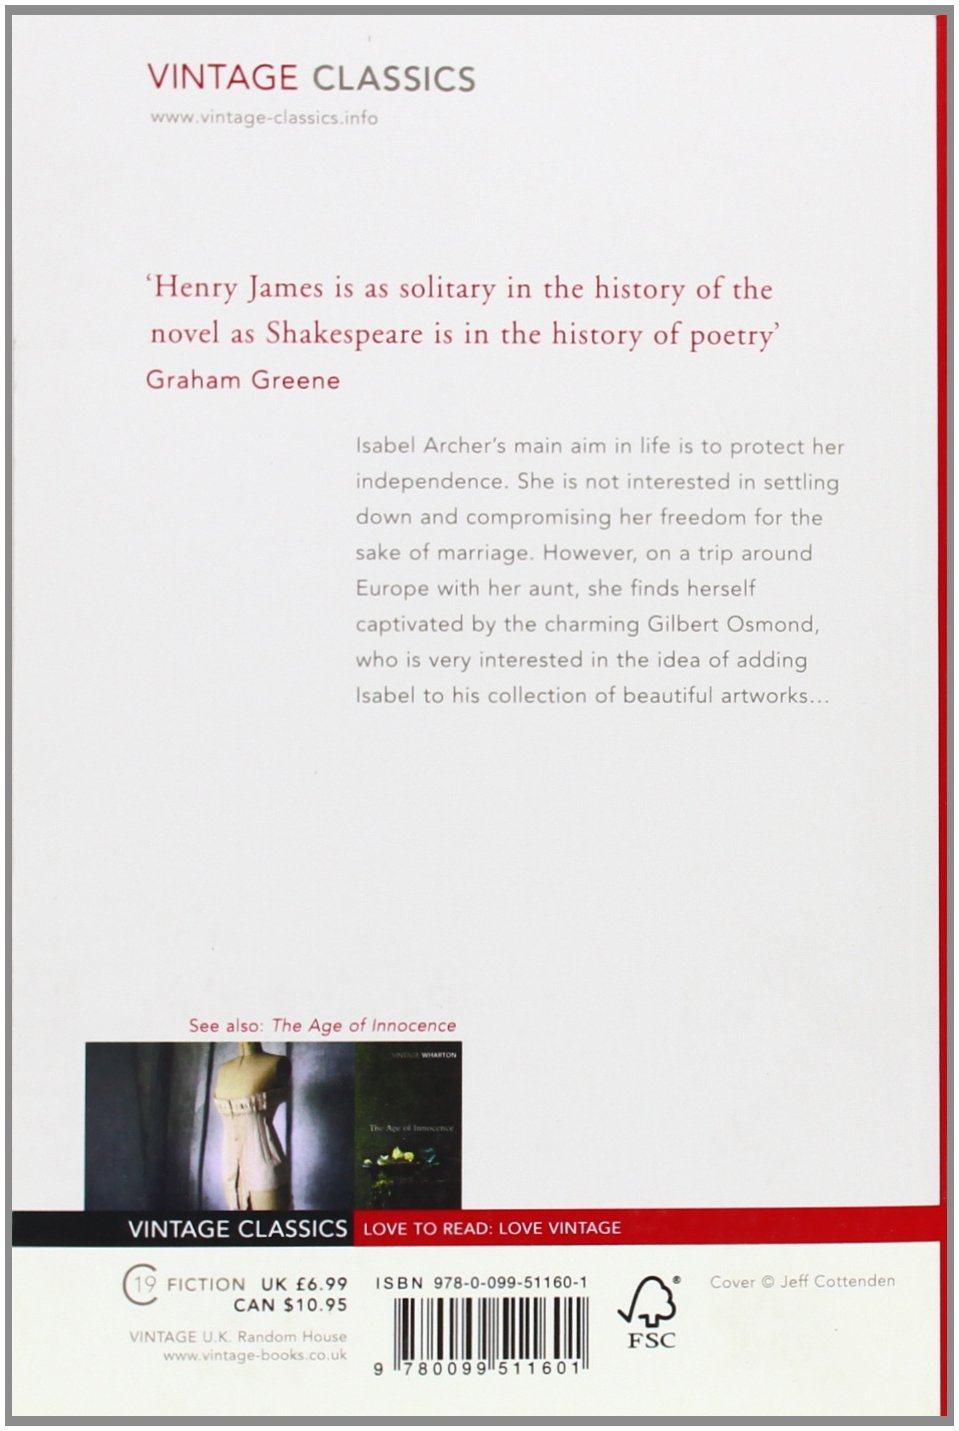 Henry James: biyografi, eserler